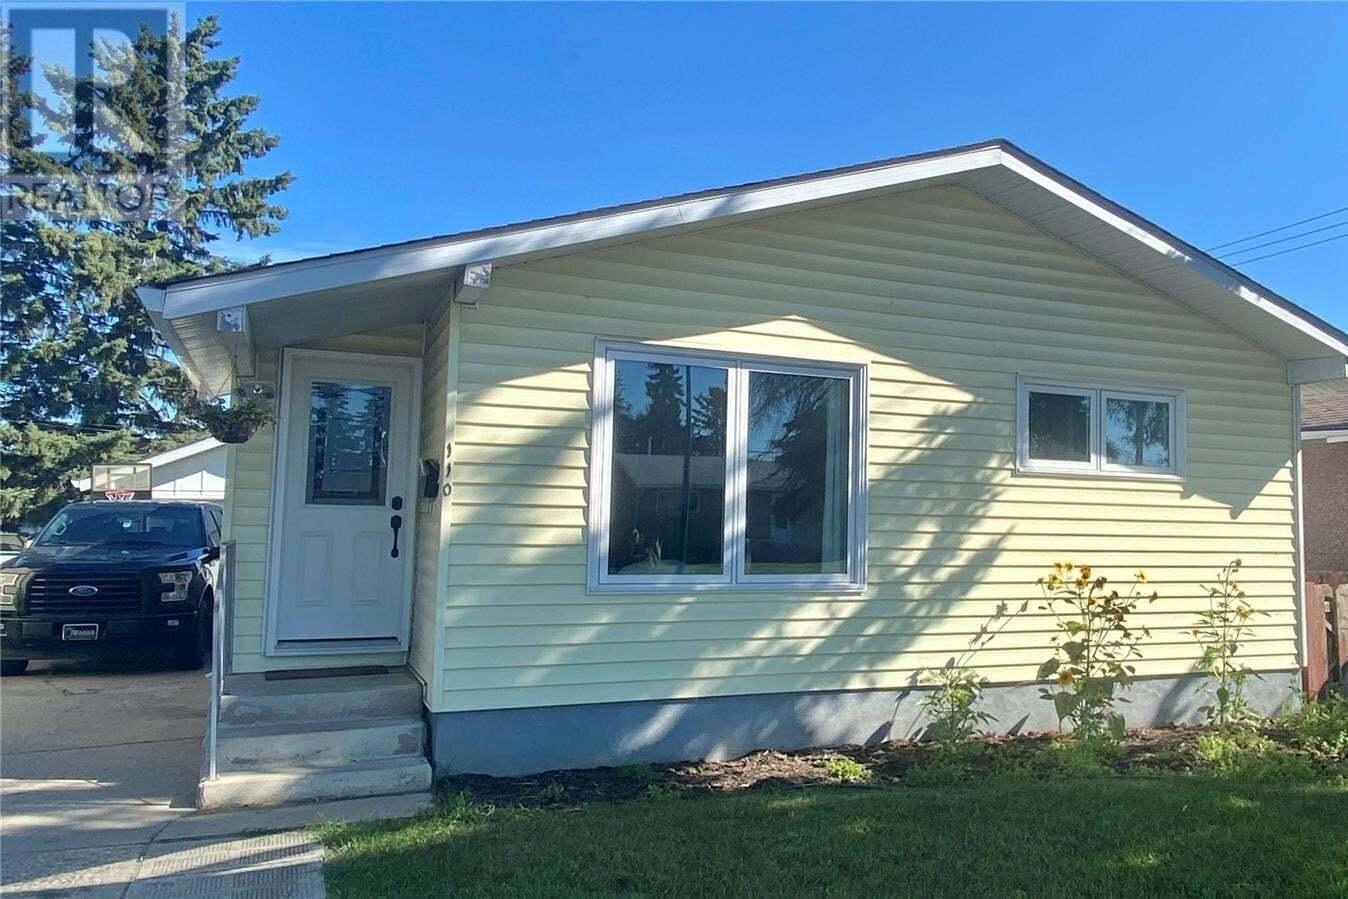 House for sale at 110 31st St W Prince Albert Saskatchewan - MLS: SK819541